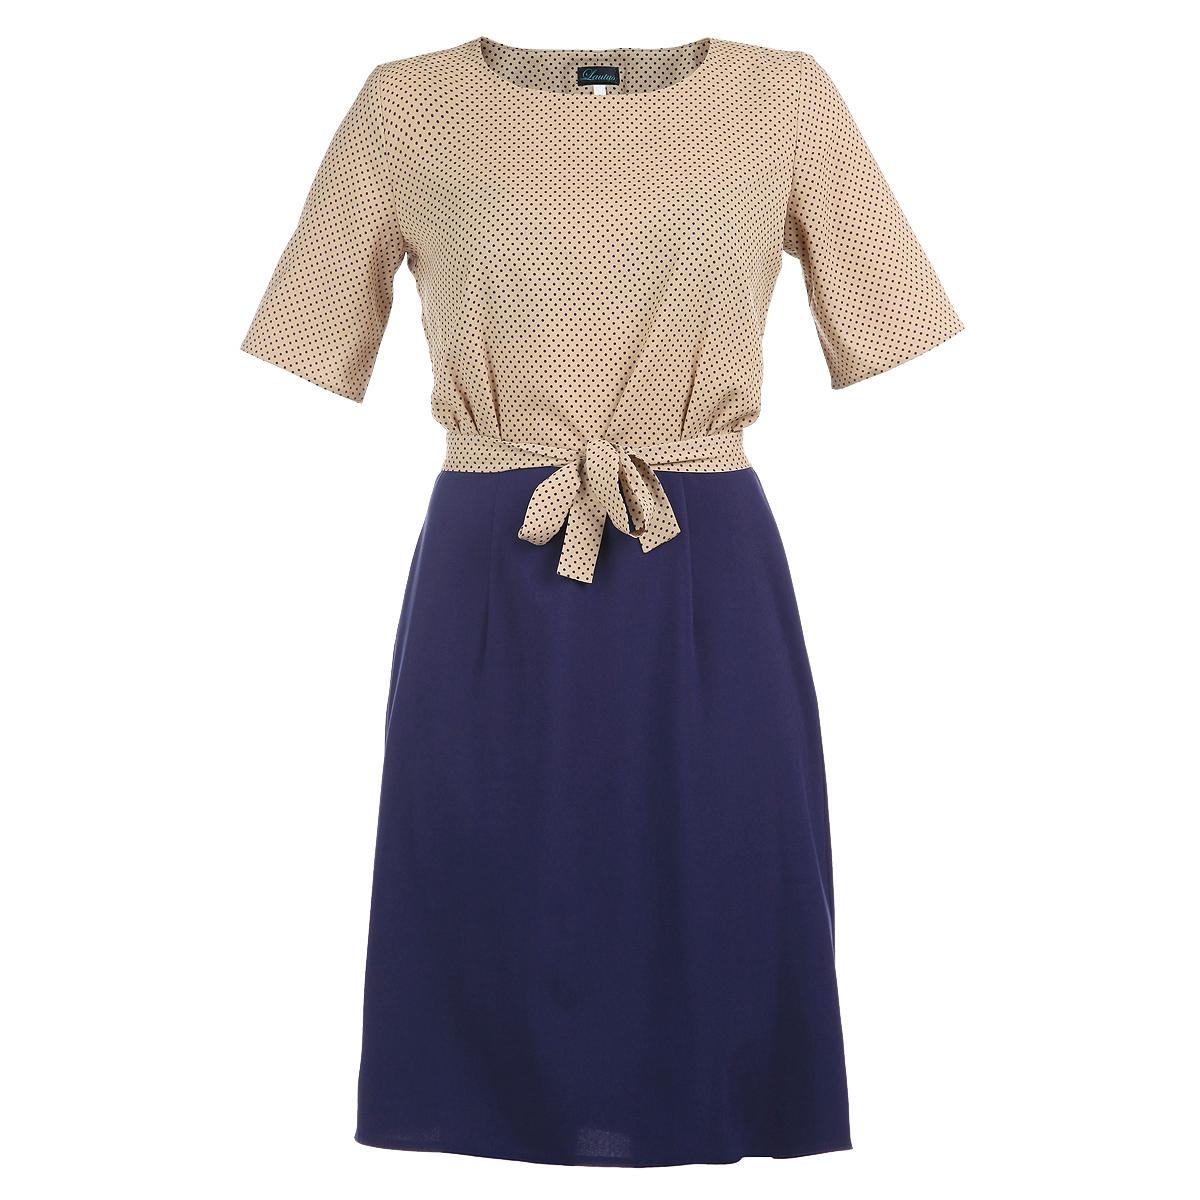 Lautus женская одежда